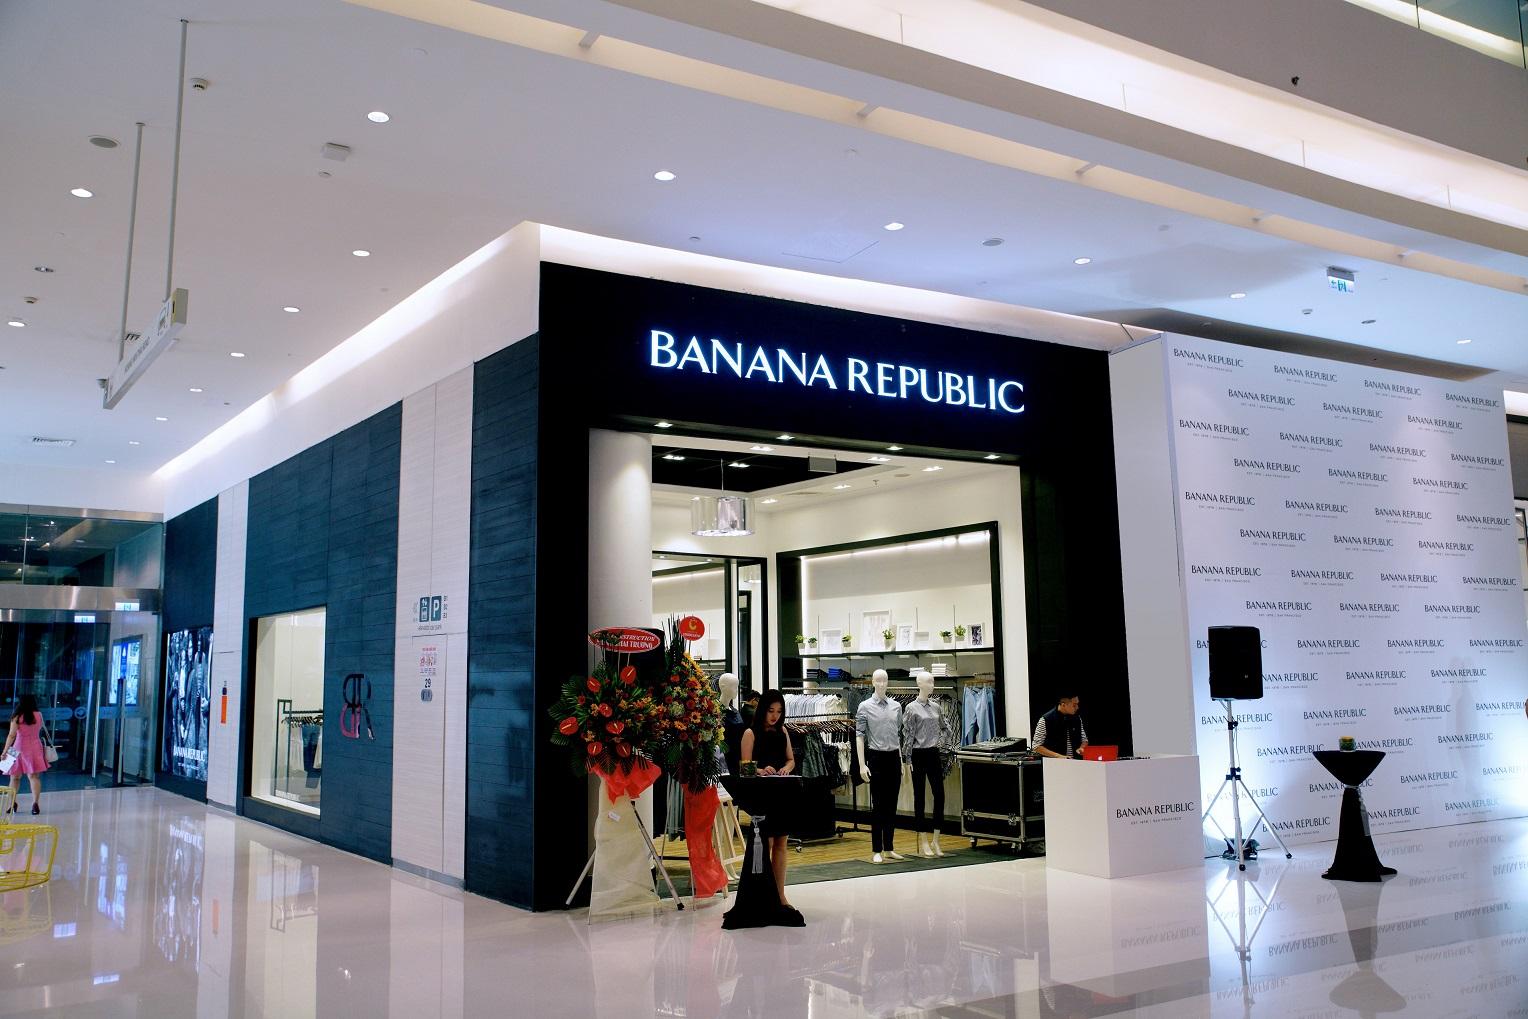 banana republic khai truong cua hang 05